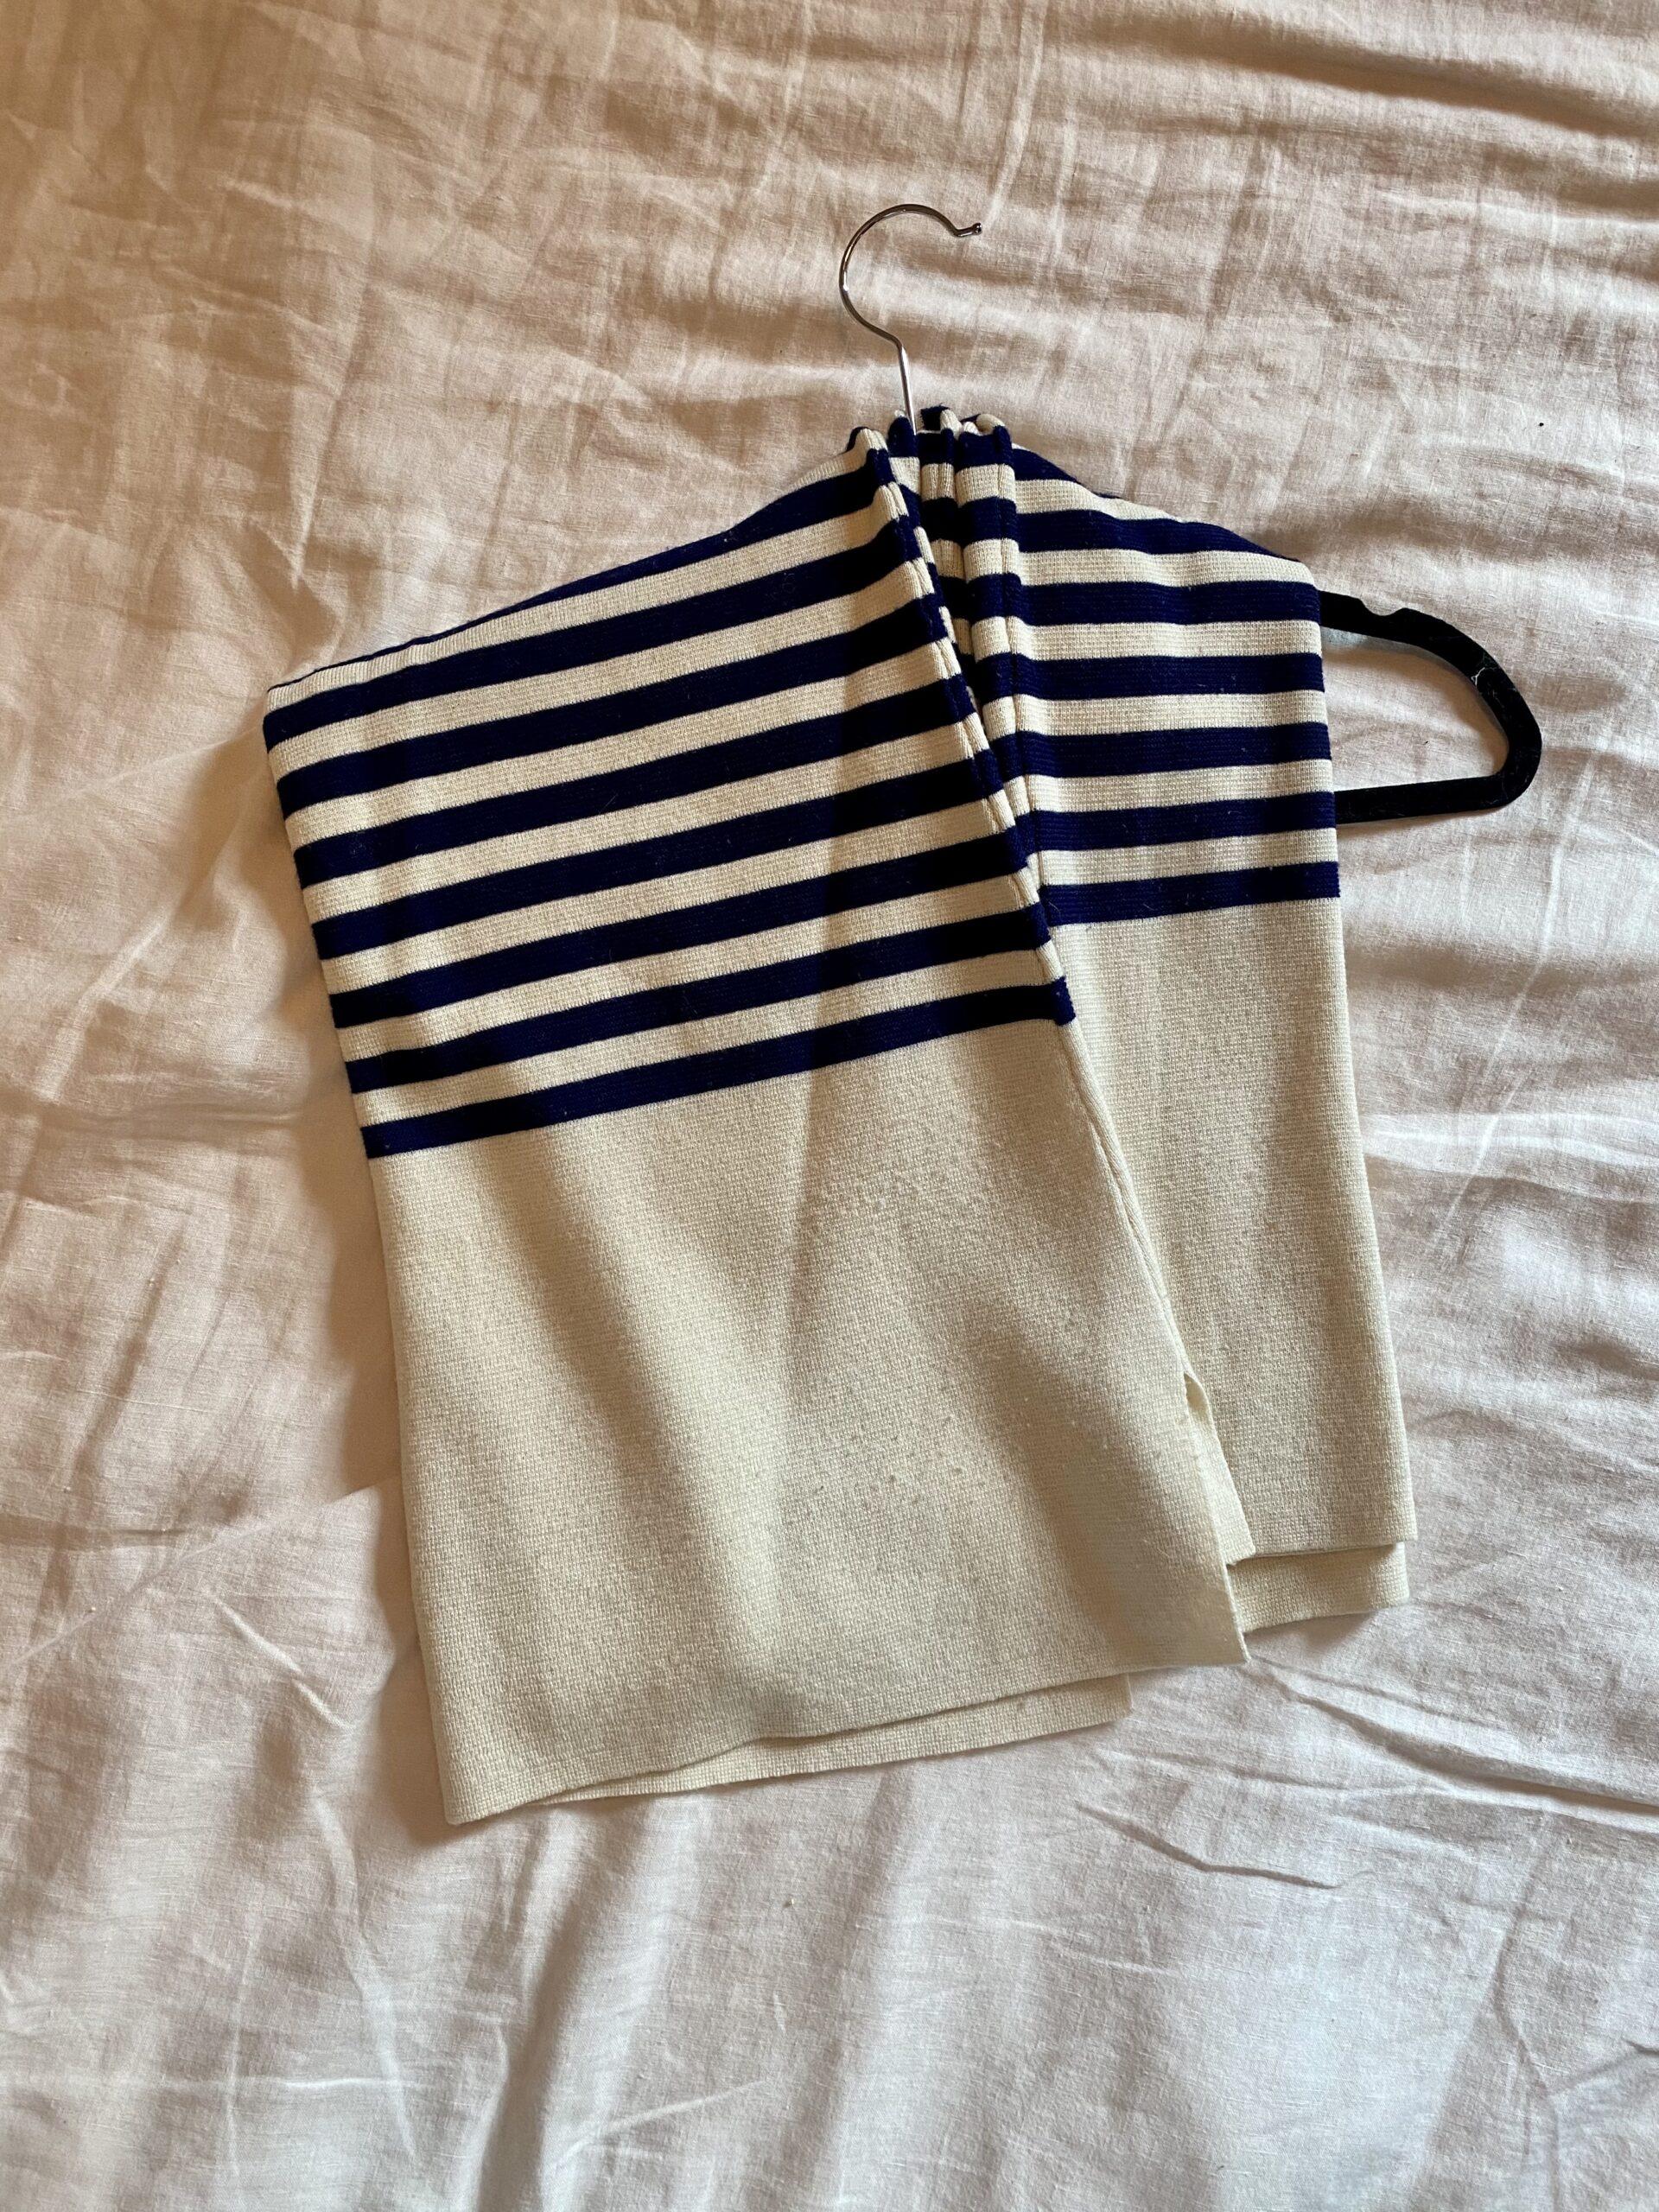 Sweater Folding Trick step 4